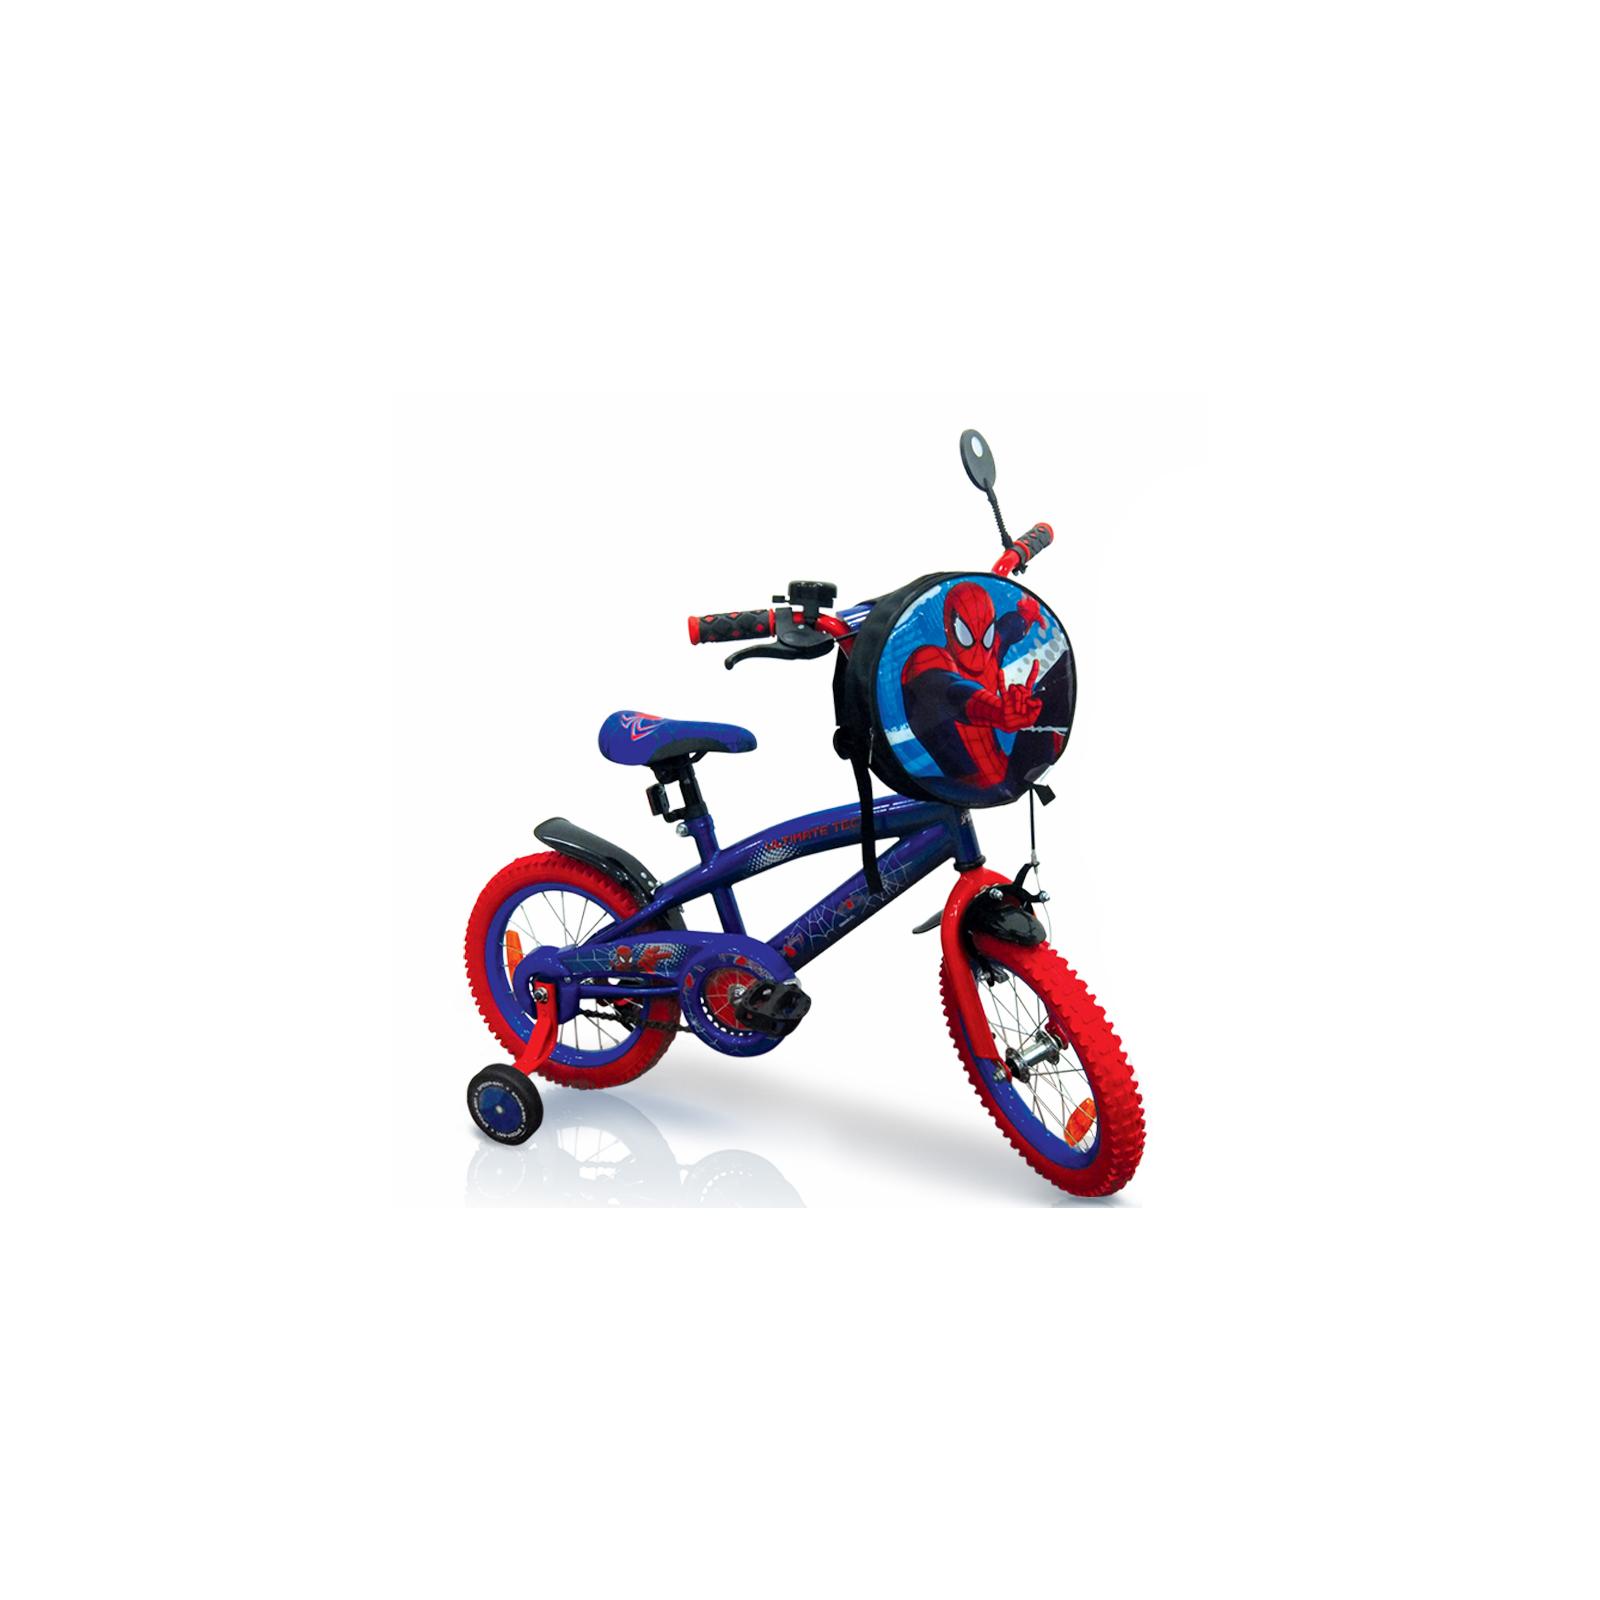 "Детский велосипед Disney 14"" Marvel Spider Man со звонком и зеркалом (SP1401)"